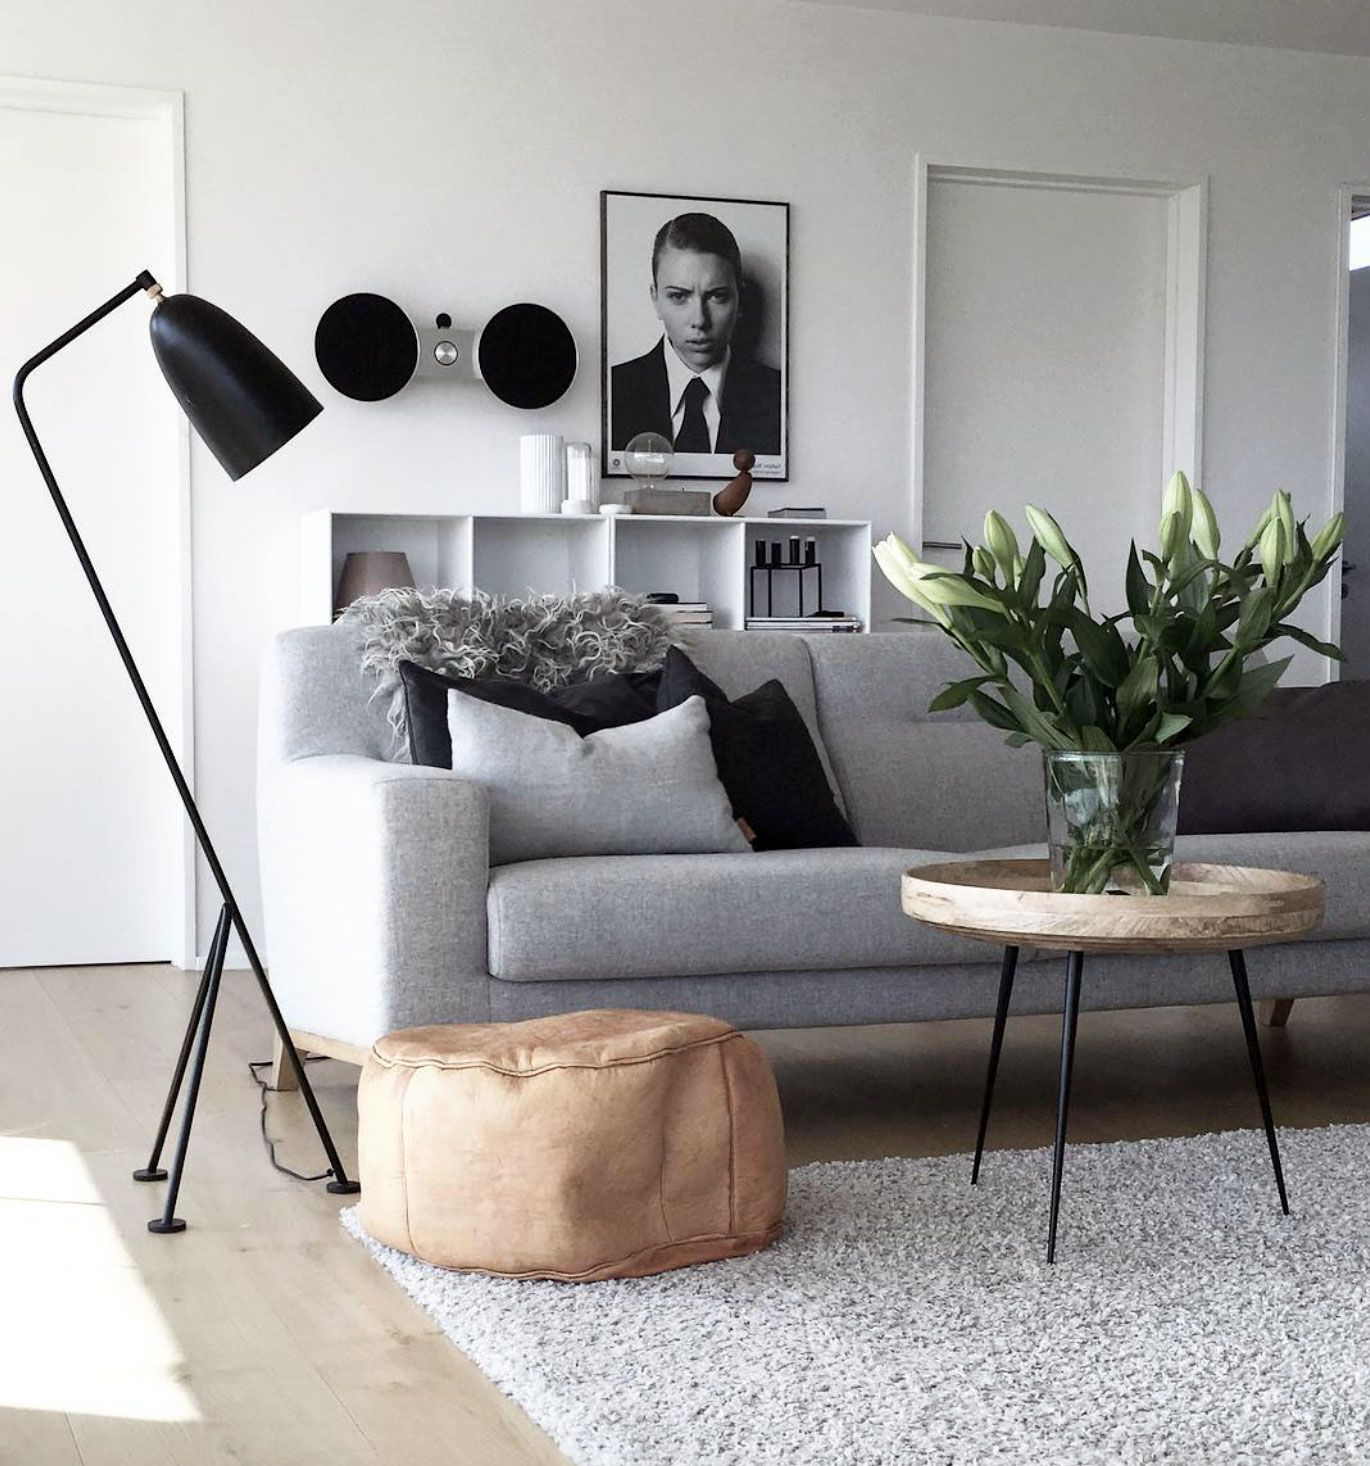 50 Adorable Mixing Rustic Theme And Scandinavian Bathroom Ideas In 2020 Scandinavian Interior Design Modern Scandinavian Interior Scandinavian Design Living Room